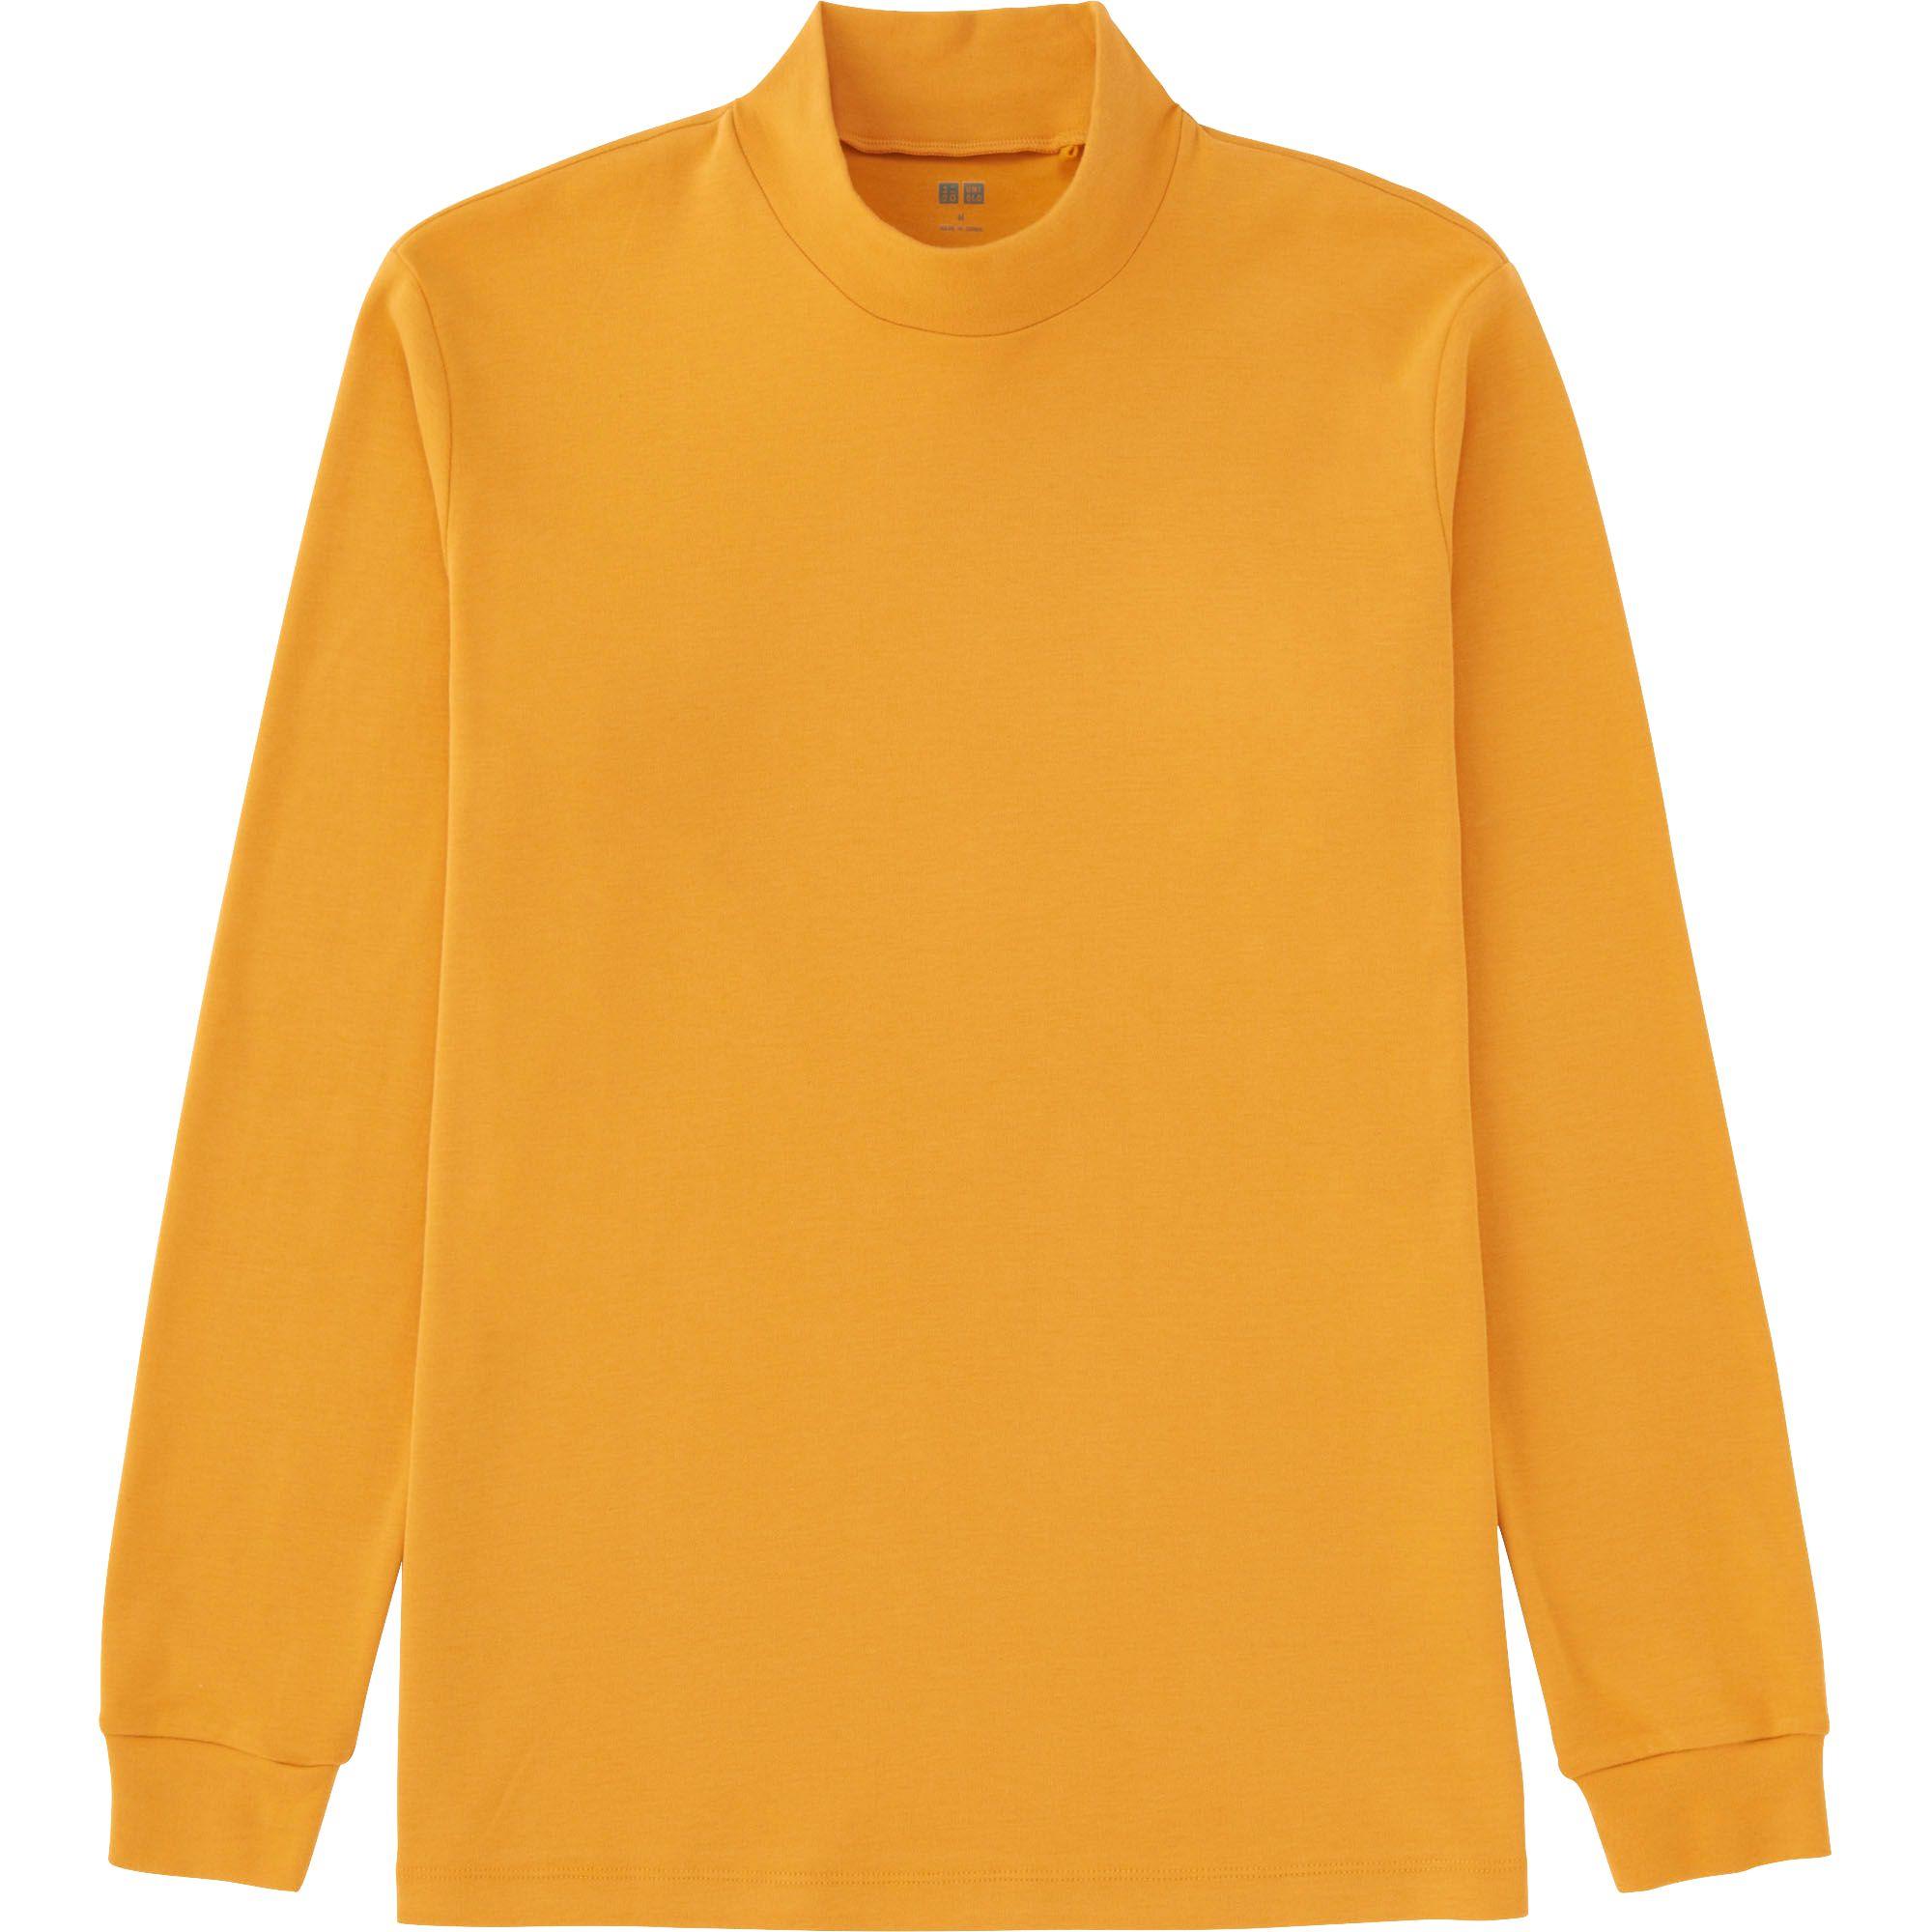 Uniqlo men soft touch mock neck long sleeve t shirt in for Mock long sleeve t shirts